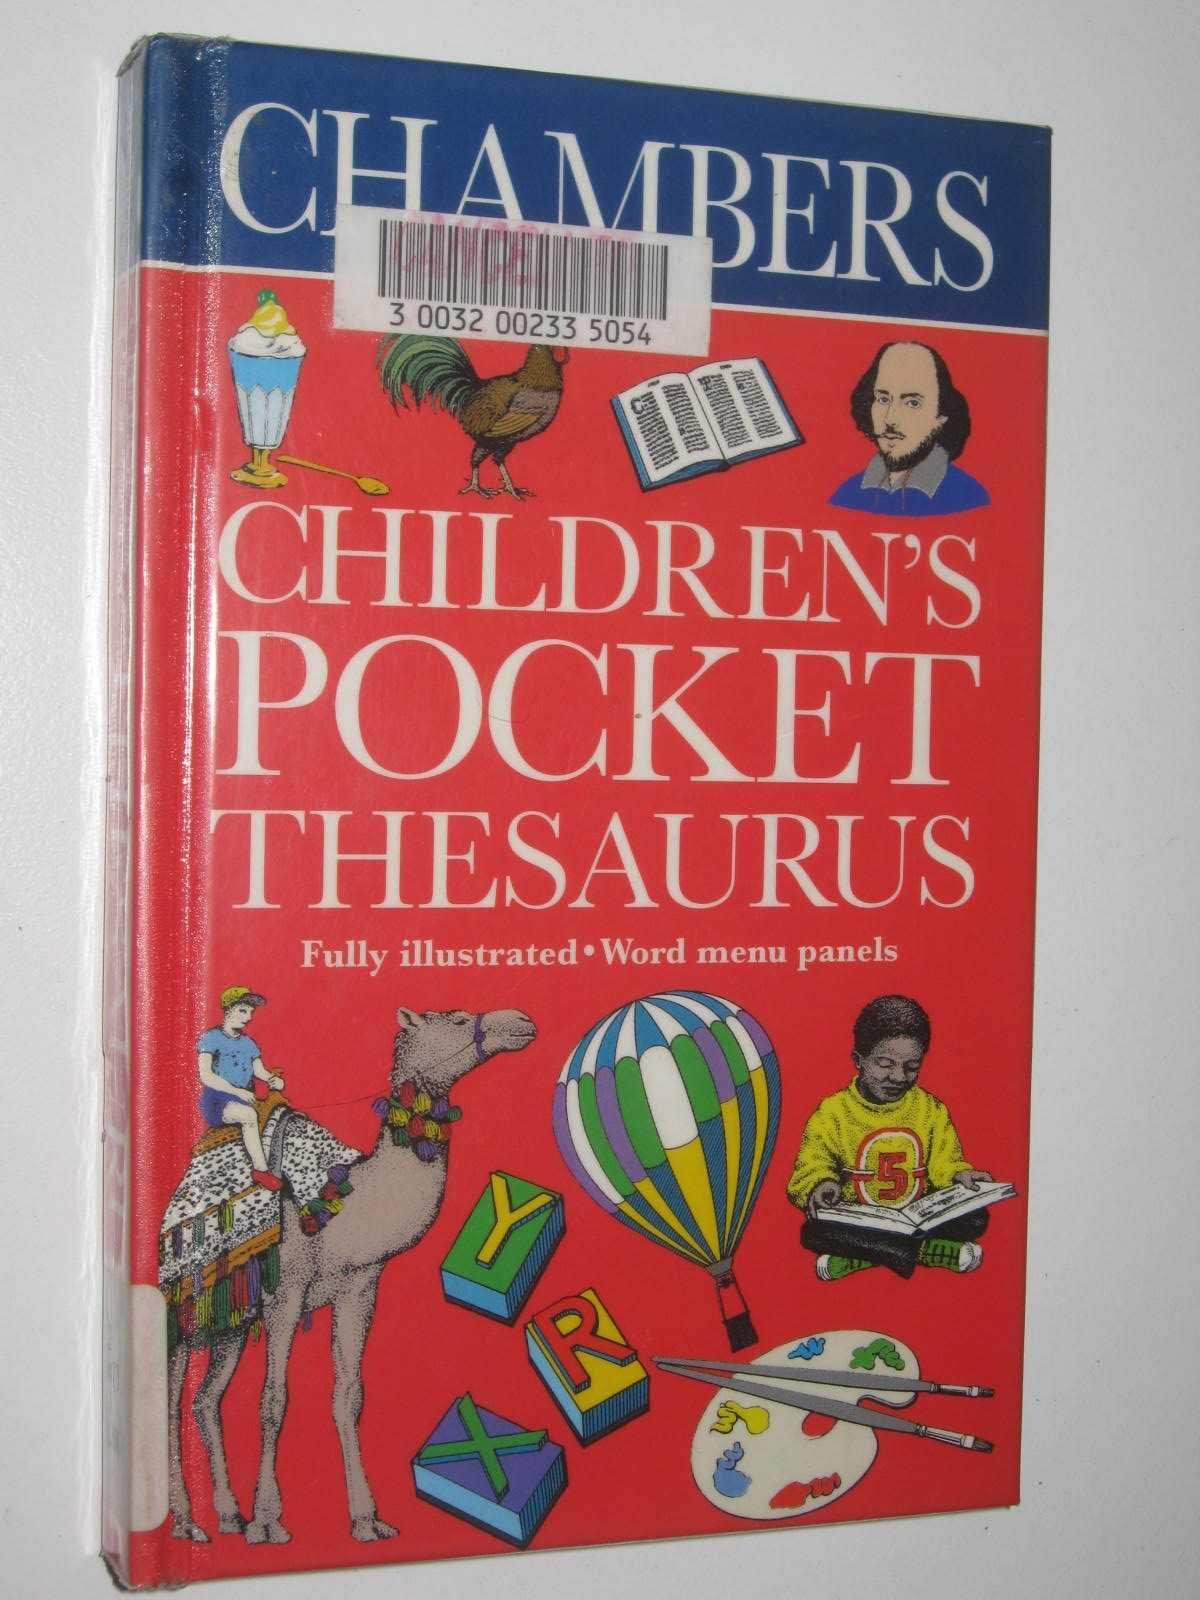 Image for Chambers Children's Pocket Thesaurus